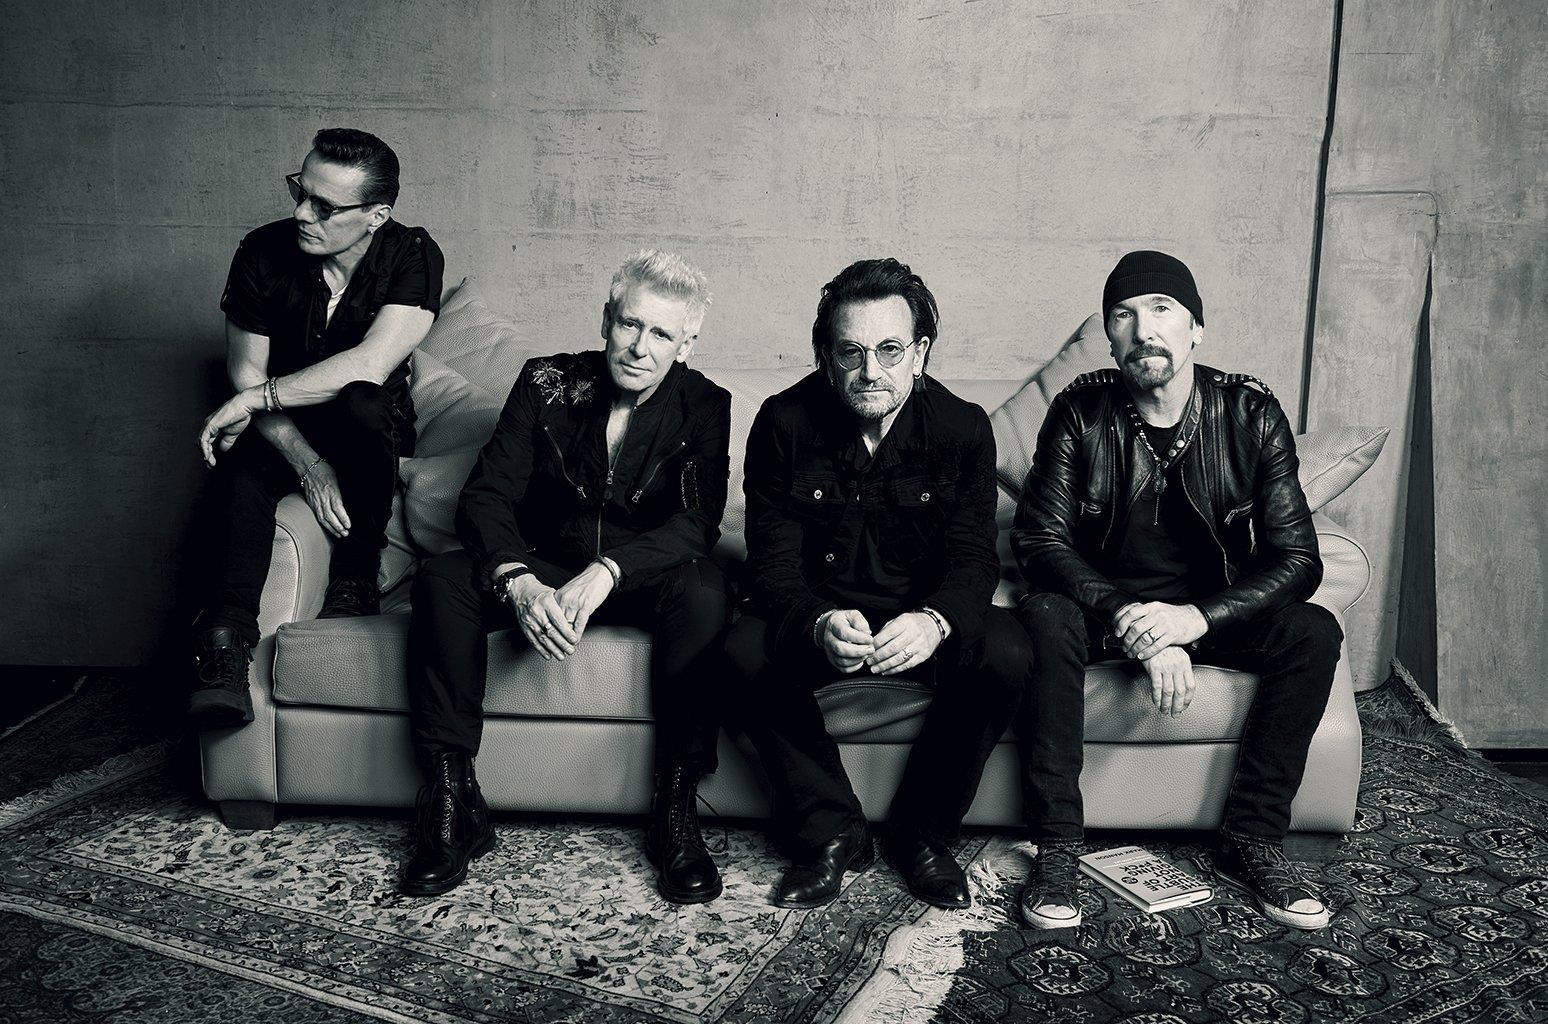 U2 snags third leader on Top Facebook Live Videos chart https://t.co/LA8pV00nV2 https://t.co/4U9eC8rNKX